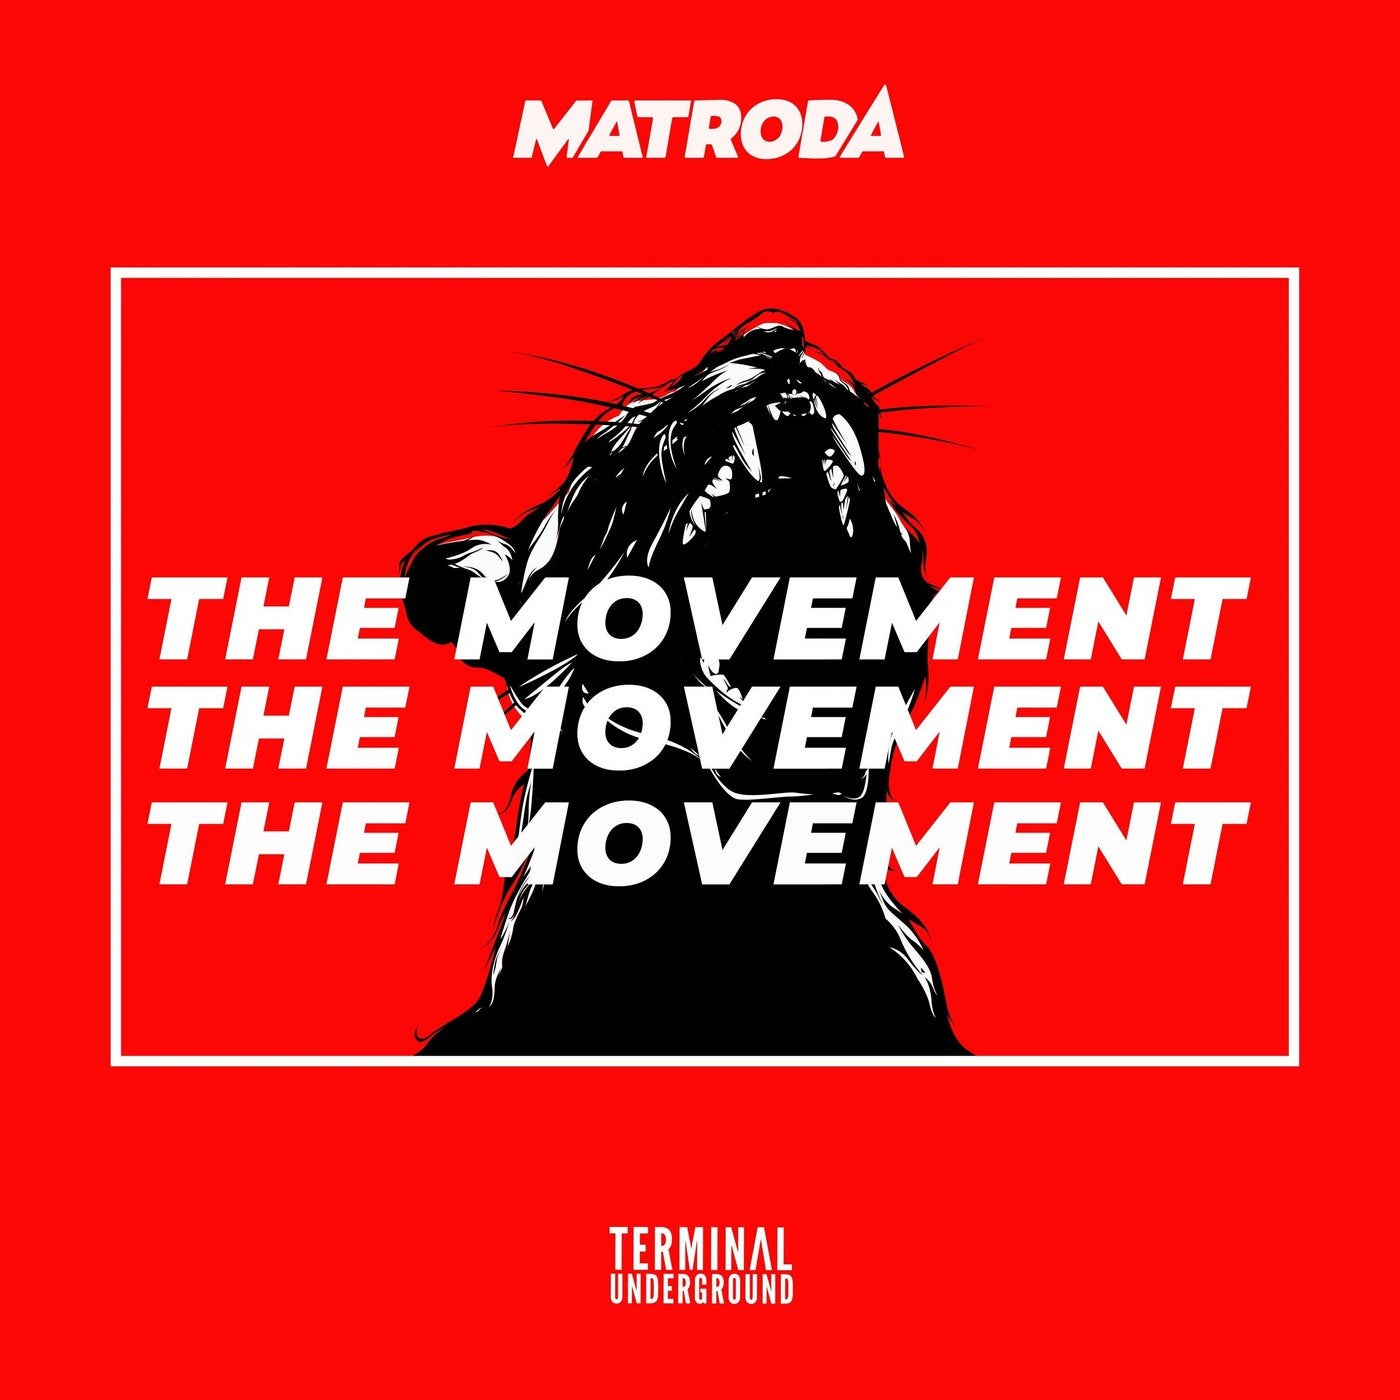 The Movement (Original Mix)